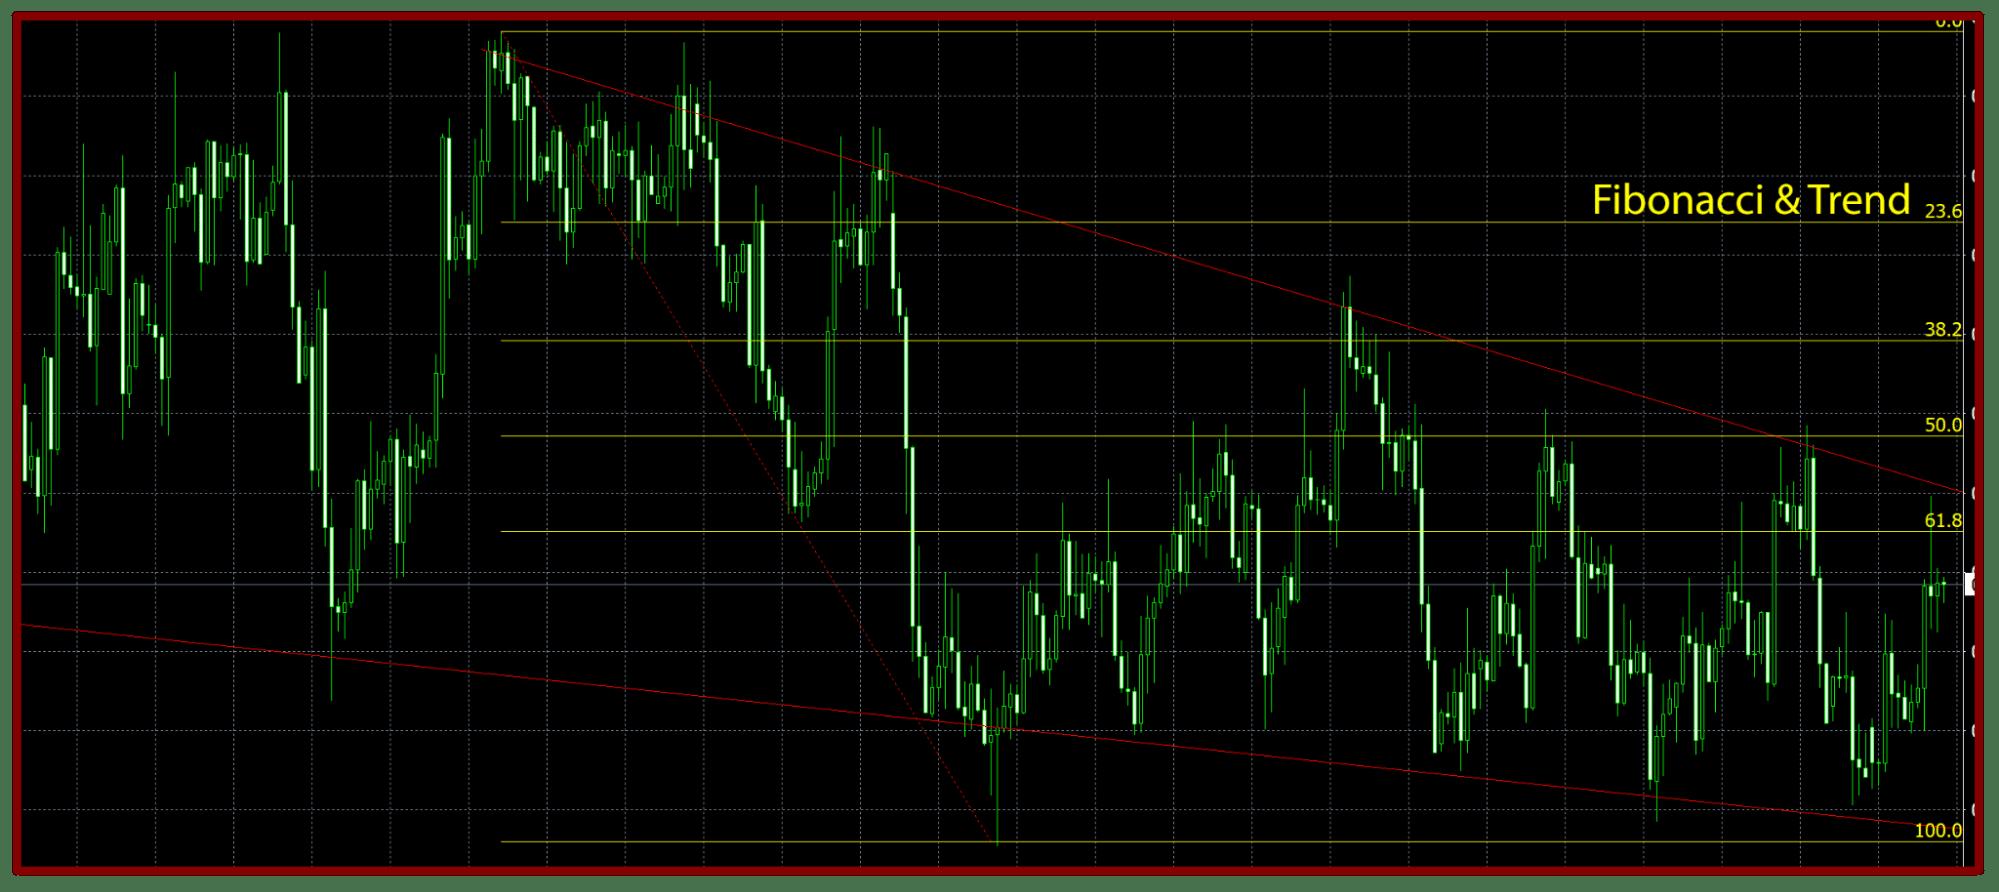 AX Trader Trading Strategy